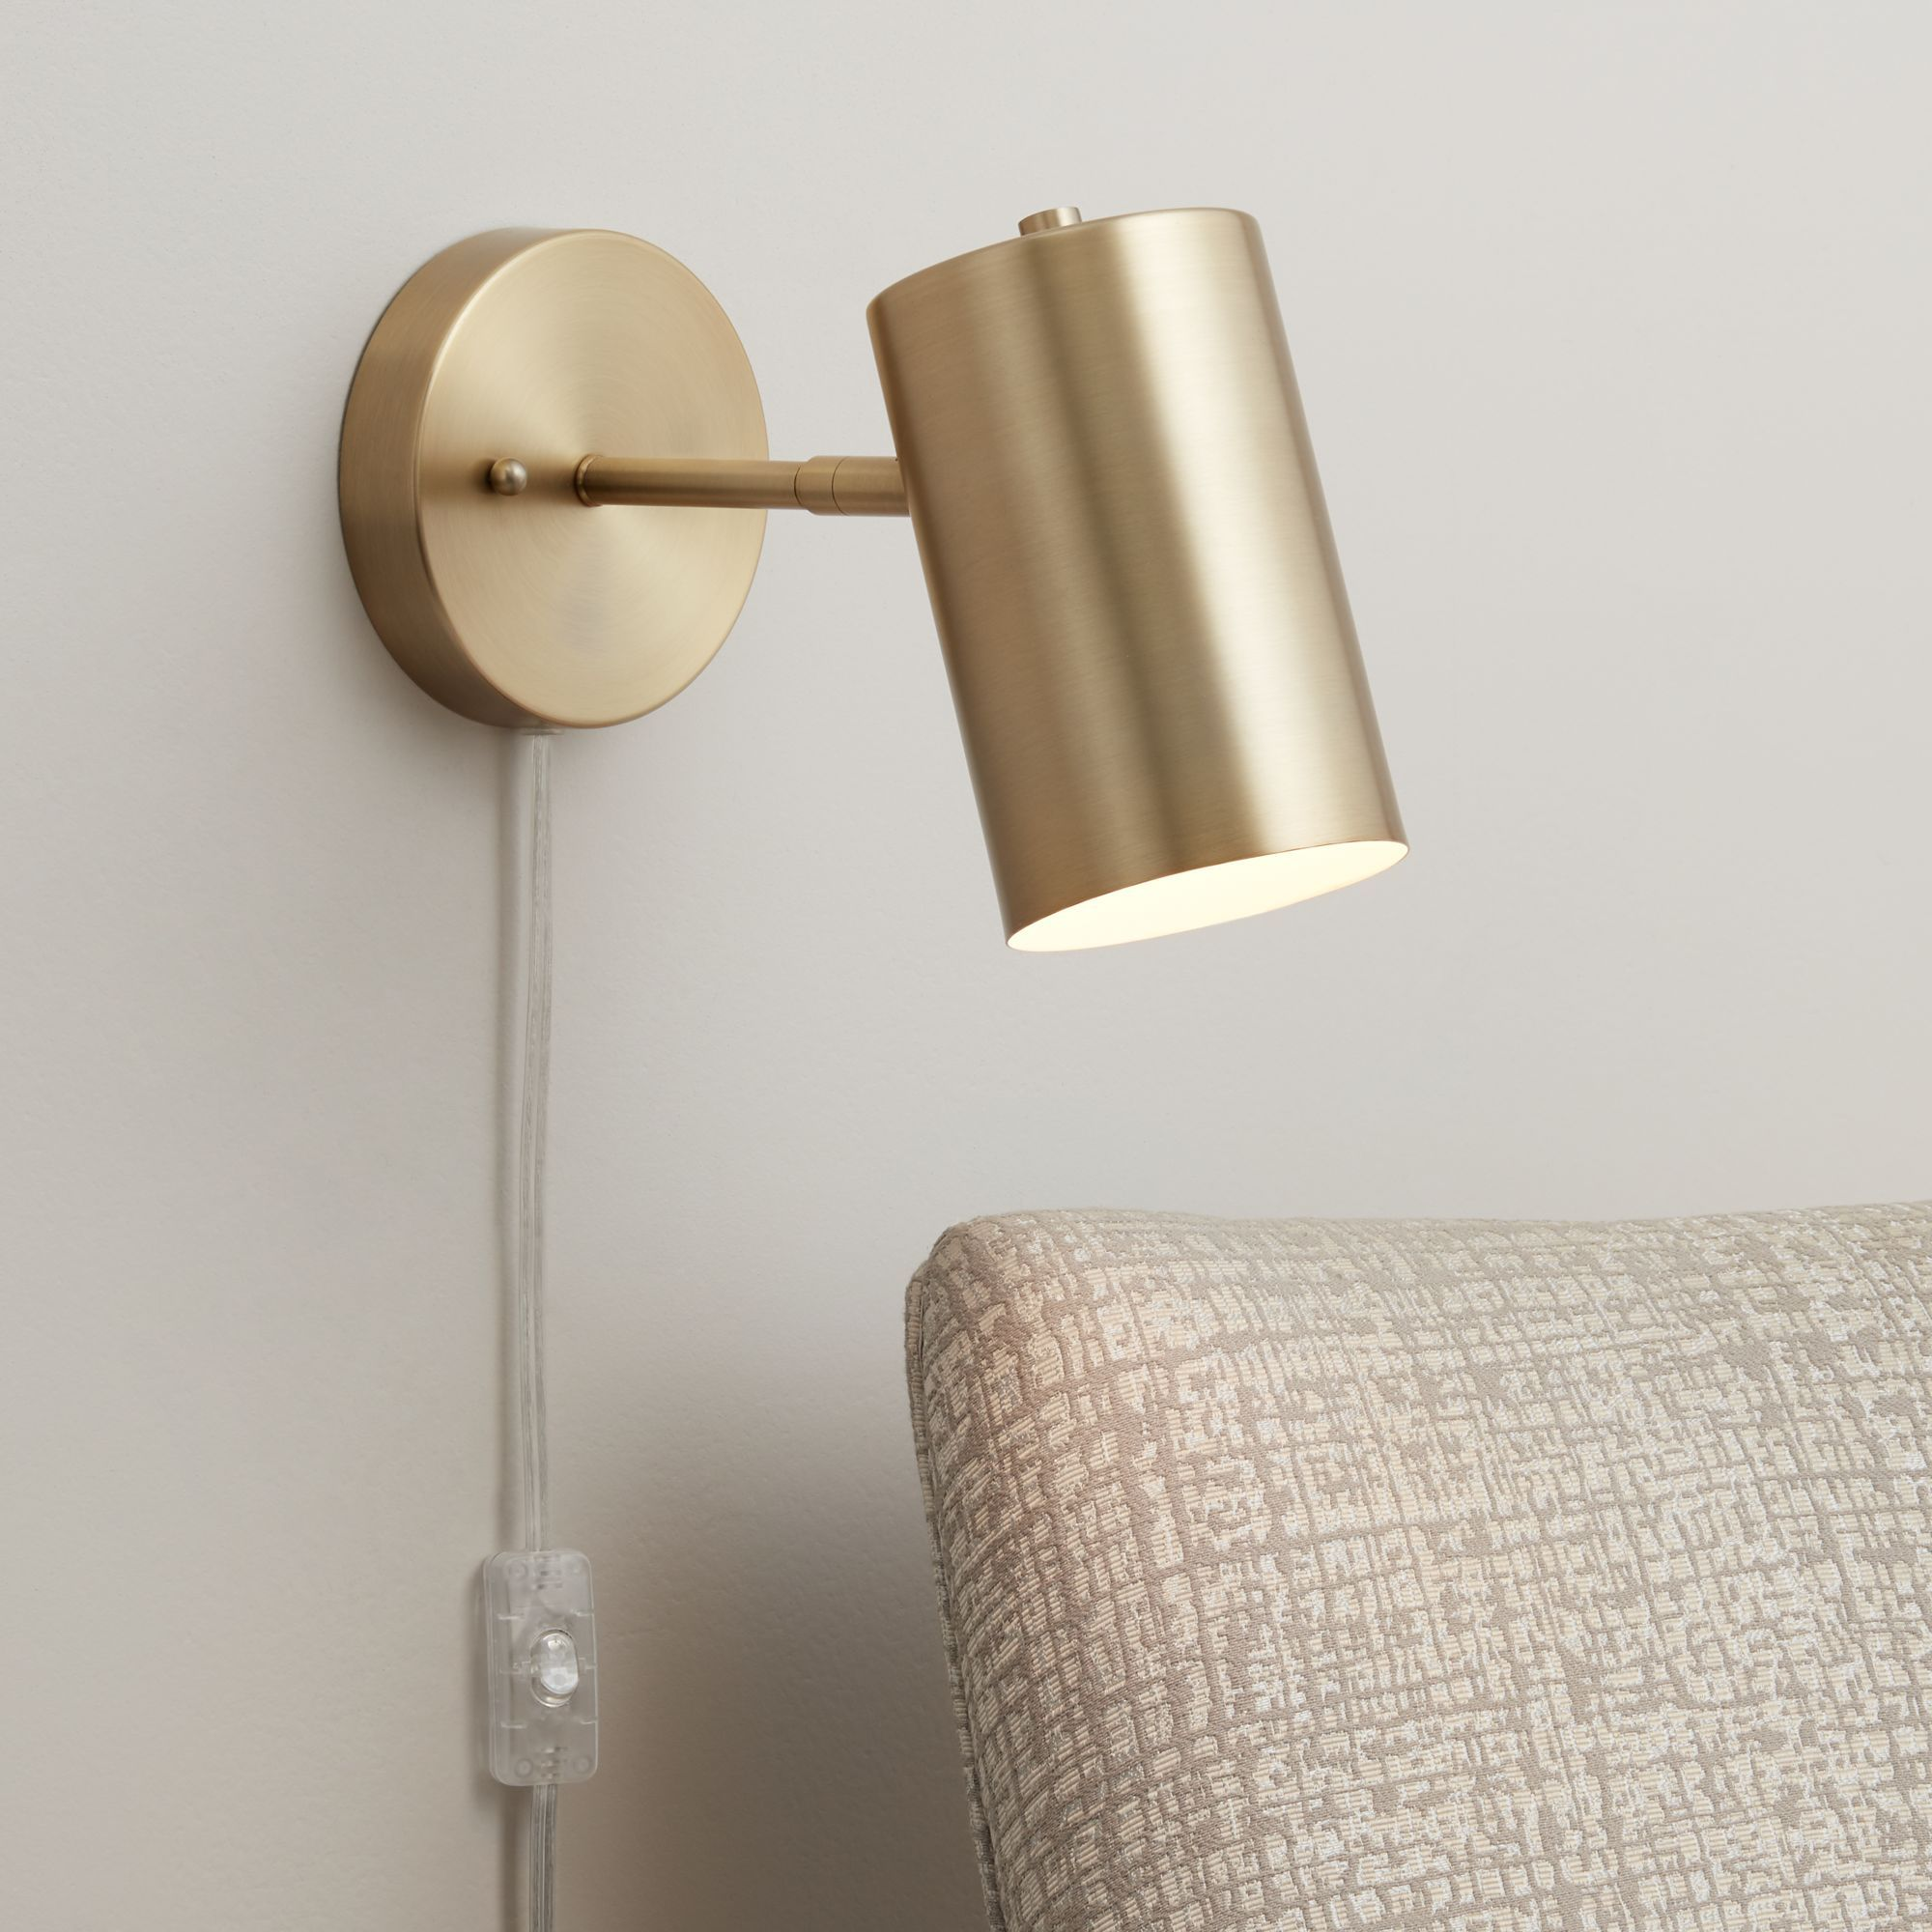 360 Lighting Modern Wall Lamp Polished Brass Plug In Light Fixture Adjustable Cylinder Down Shade For Bedroom Living Room Reading Walmart Com Plug In Wall Lamp Modern Wall Lamp Wall Lamp